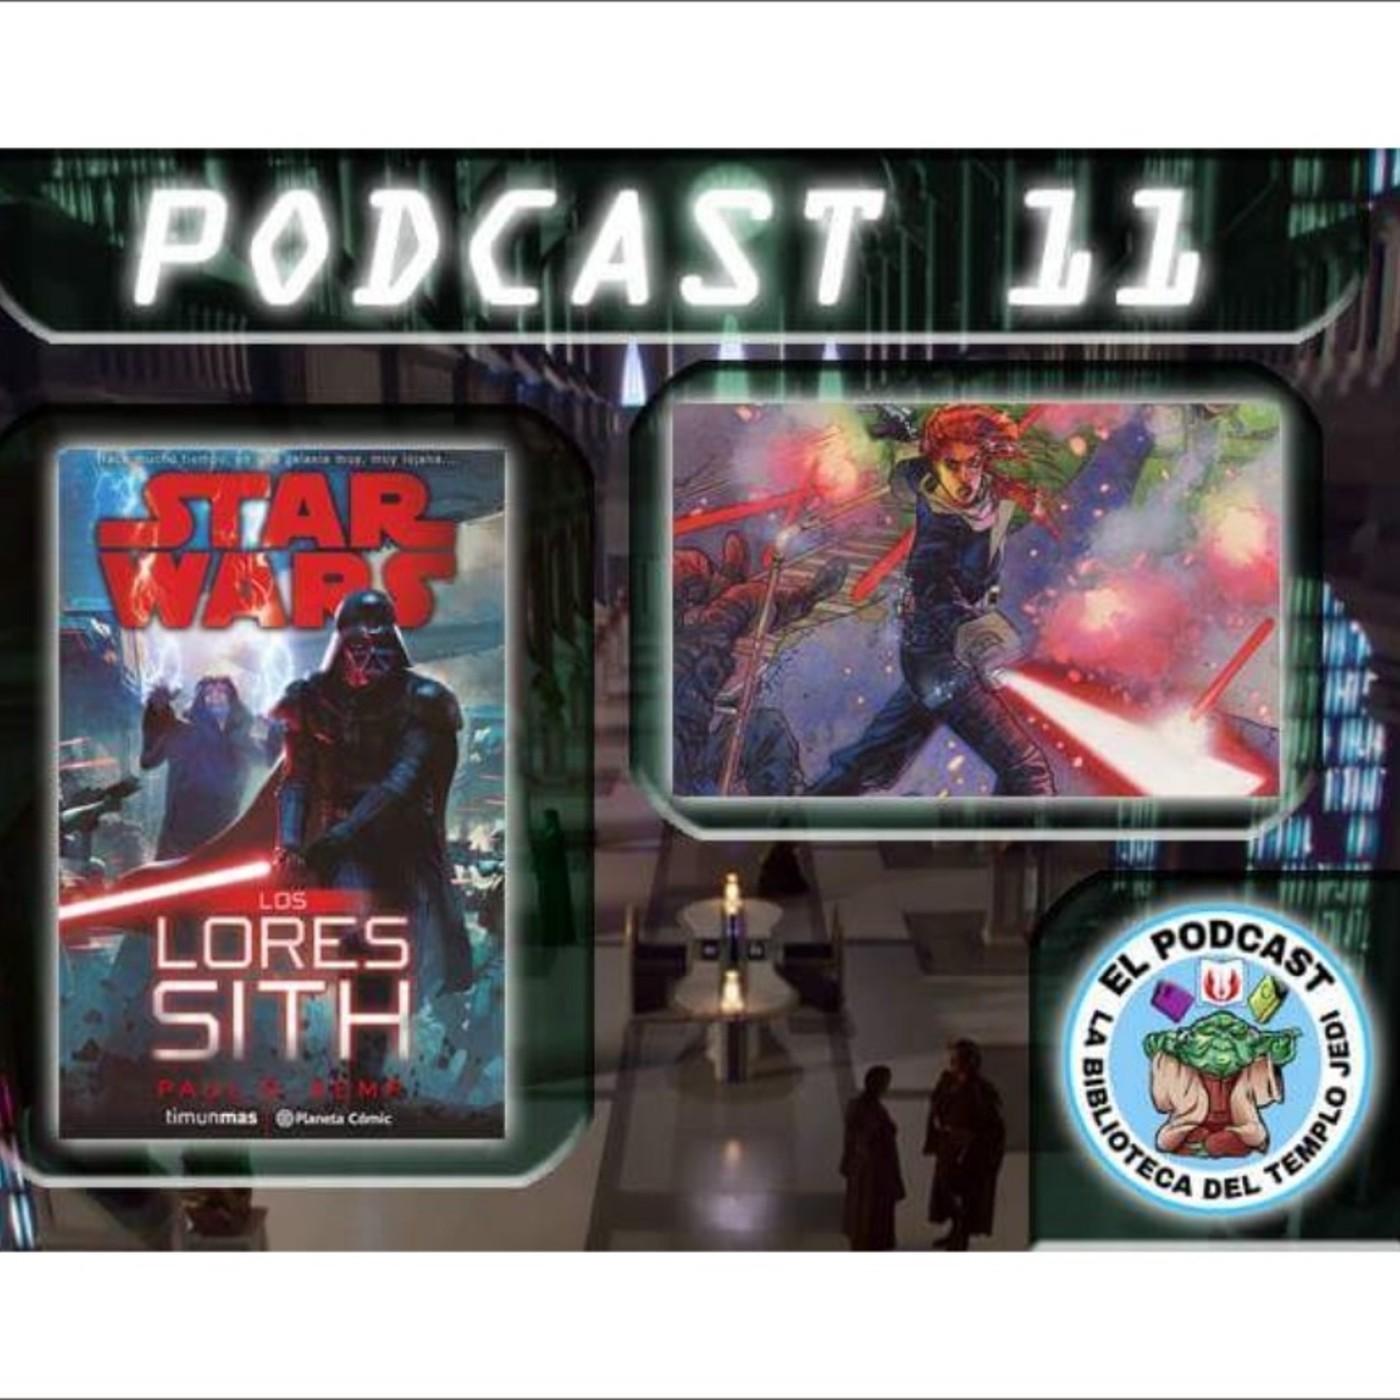 El Podcast de la Biblioteca del Templo Jedi 011